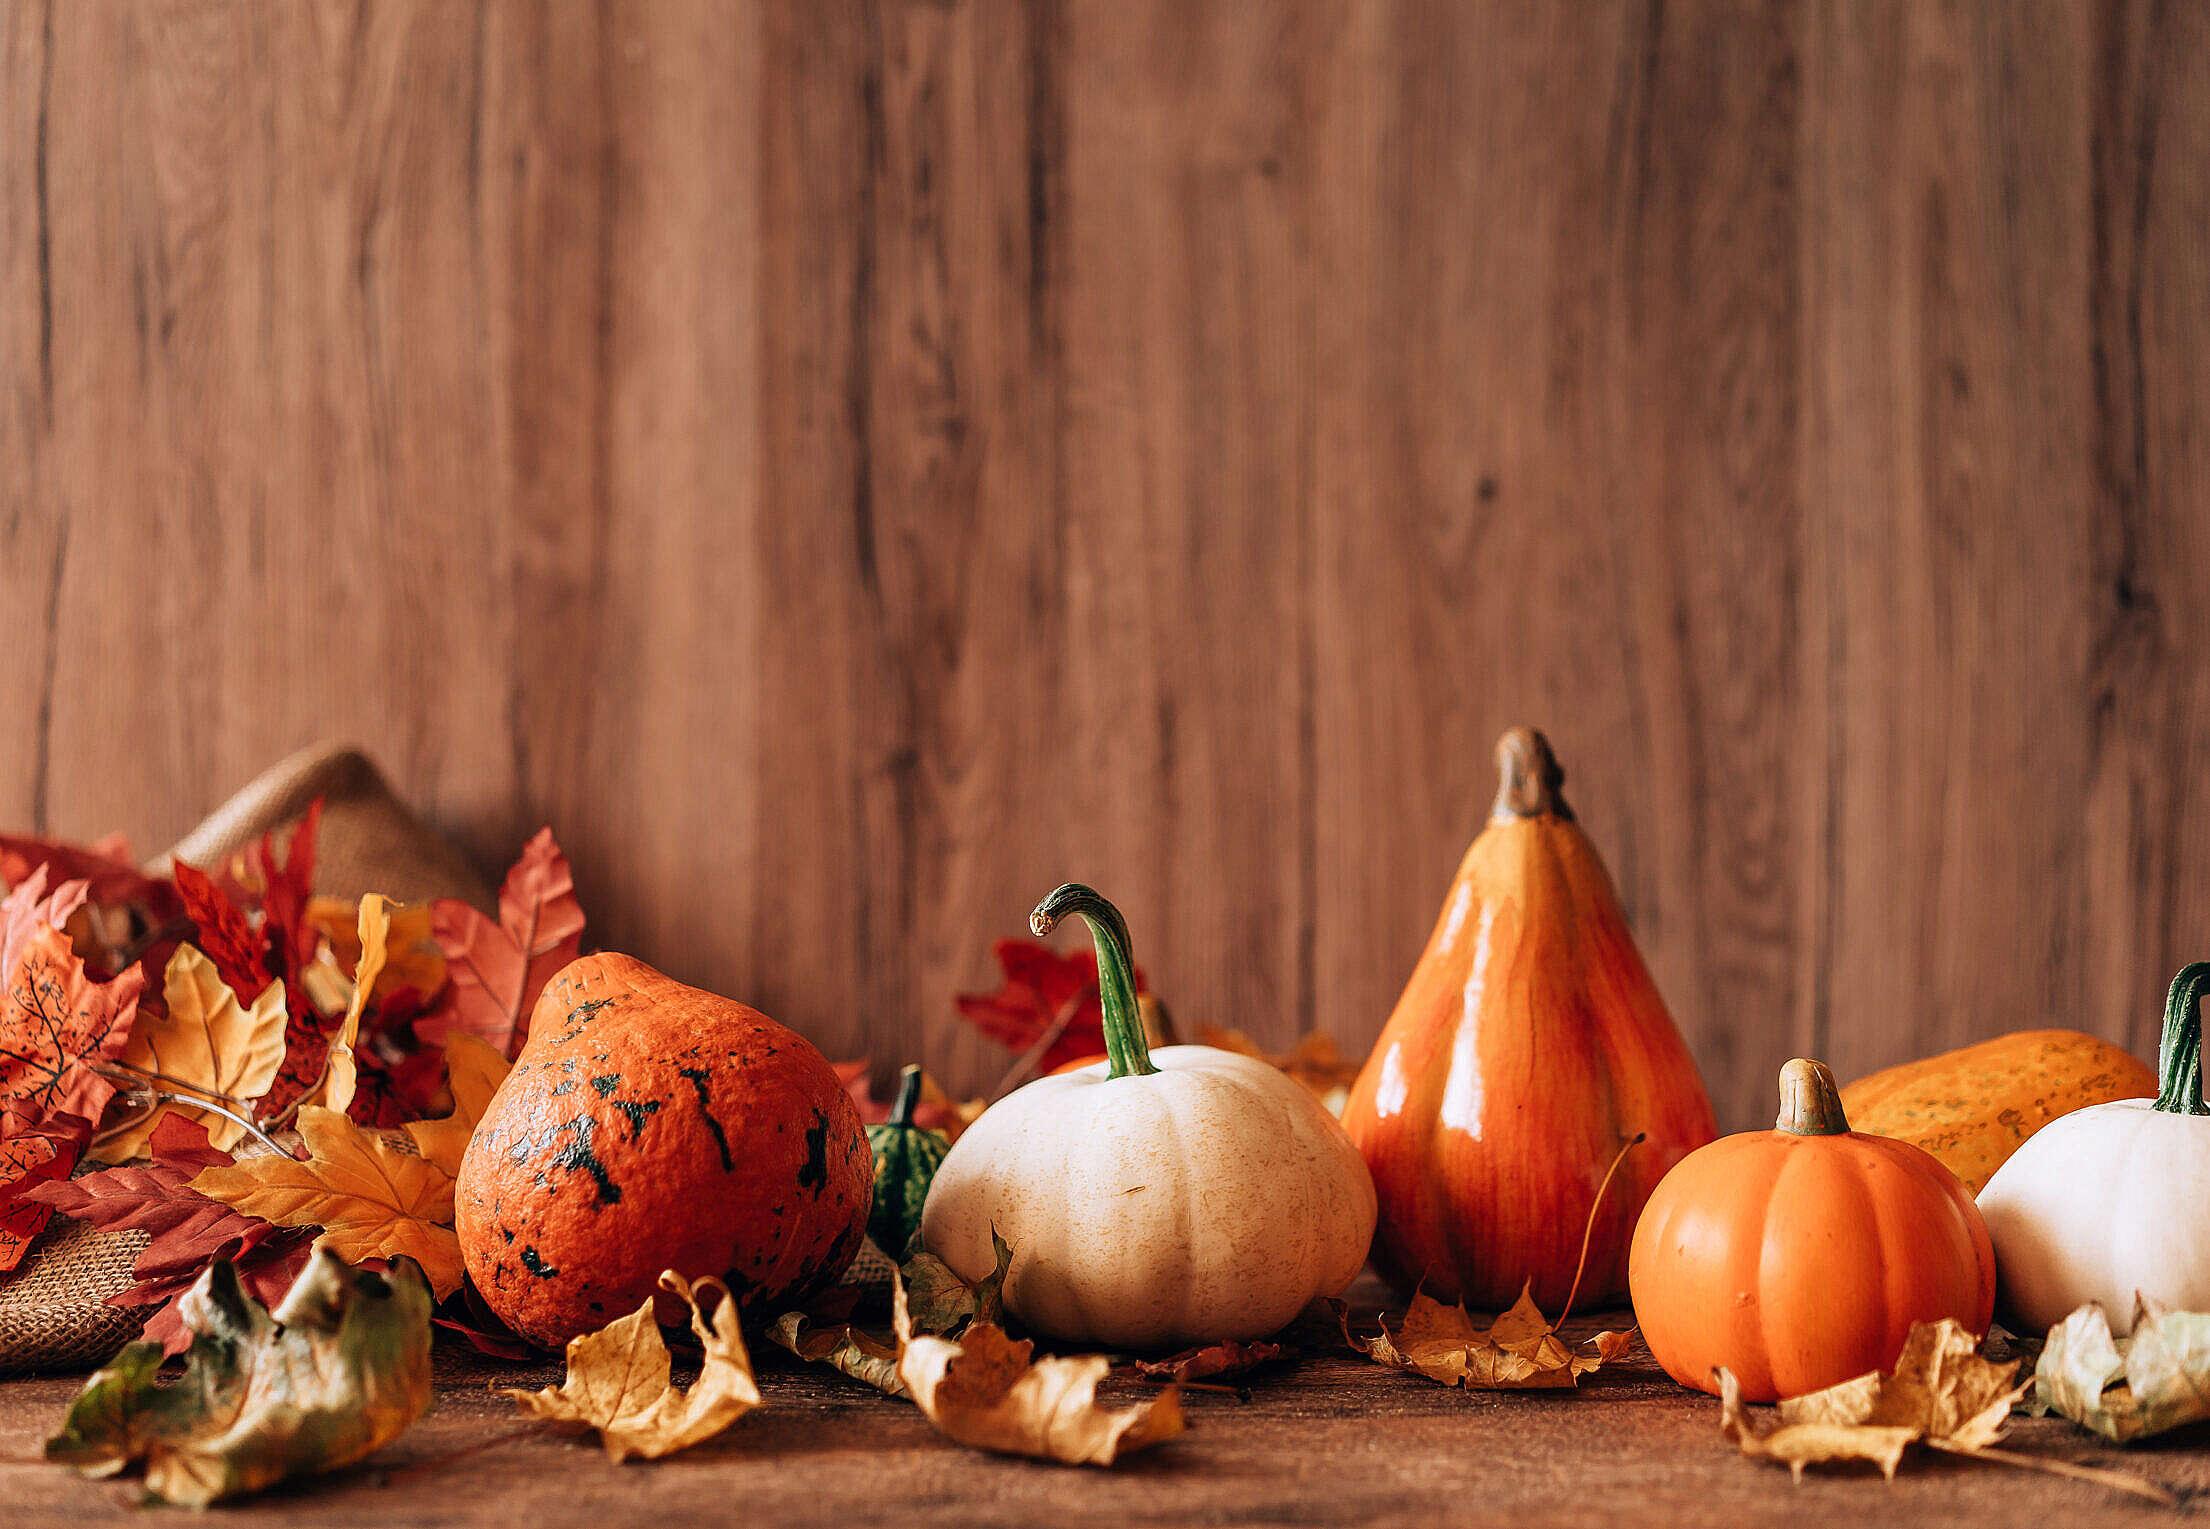 Autumn Fall Pumpkins Decorative Background Free Stock Photo